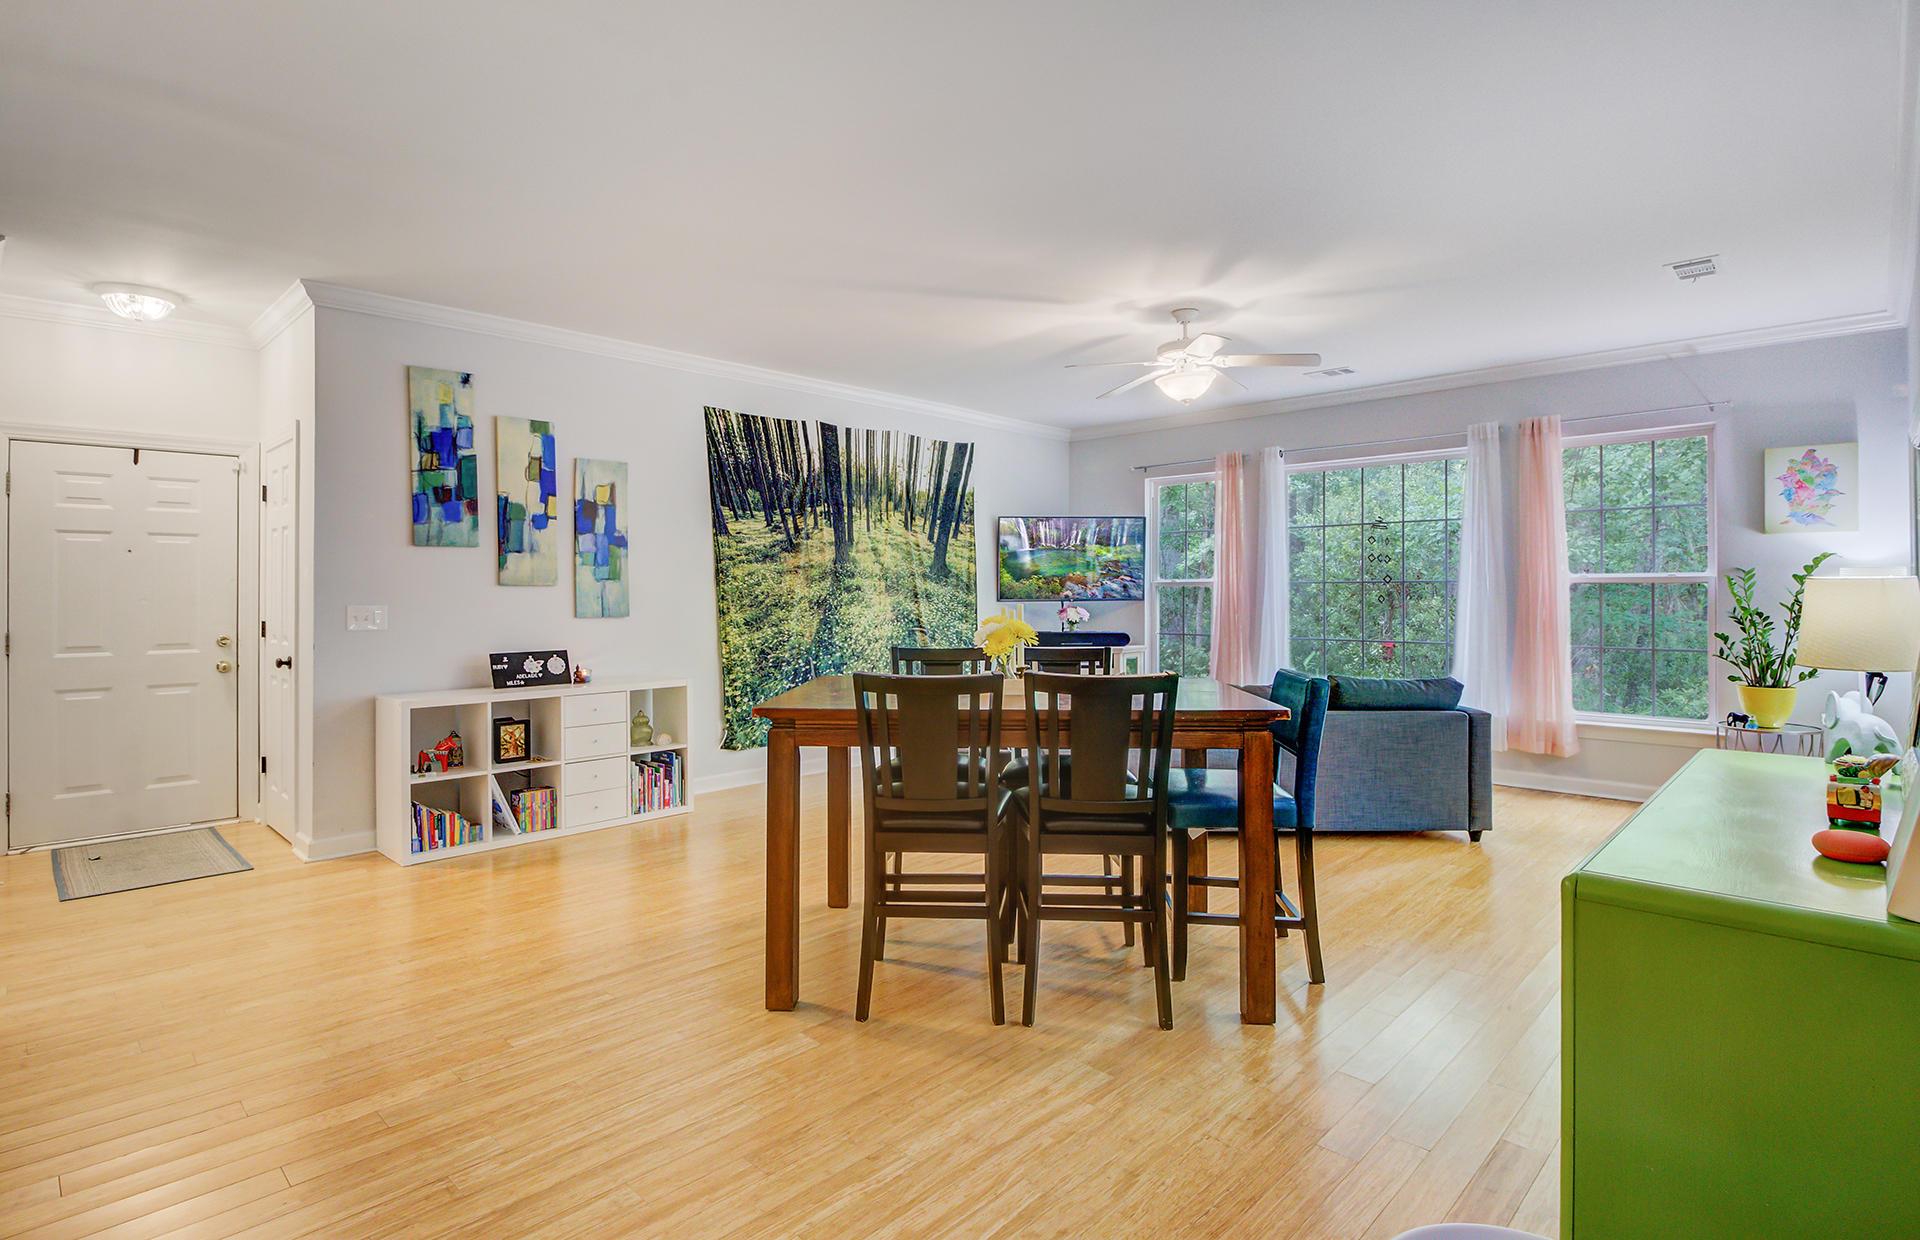 Dunes West Homes For Sale - 1566 Oxborough, Mount Pleasant, SC - 1